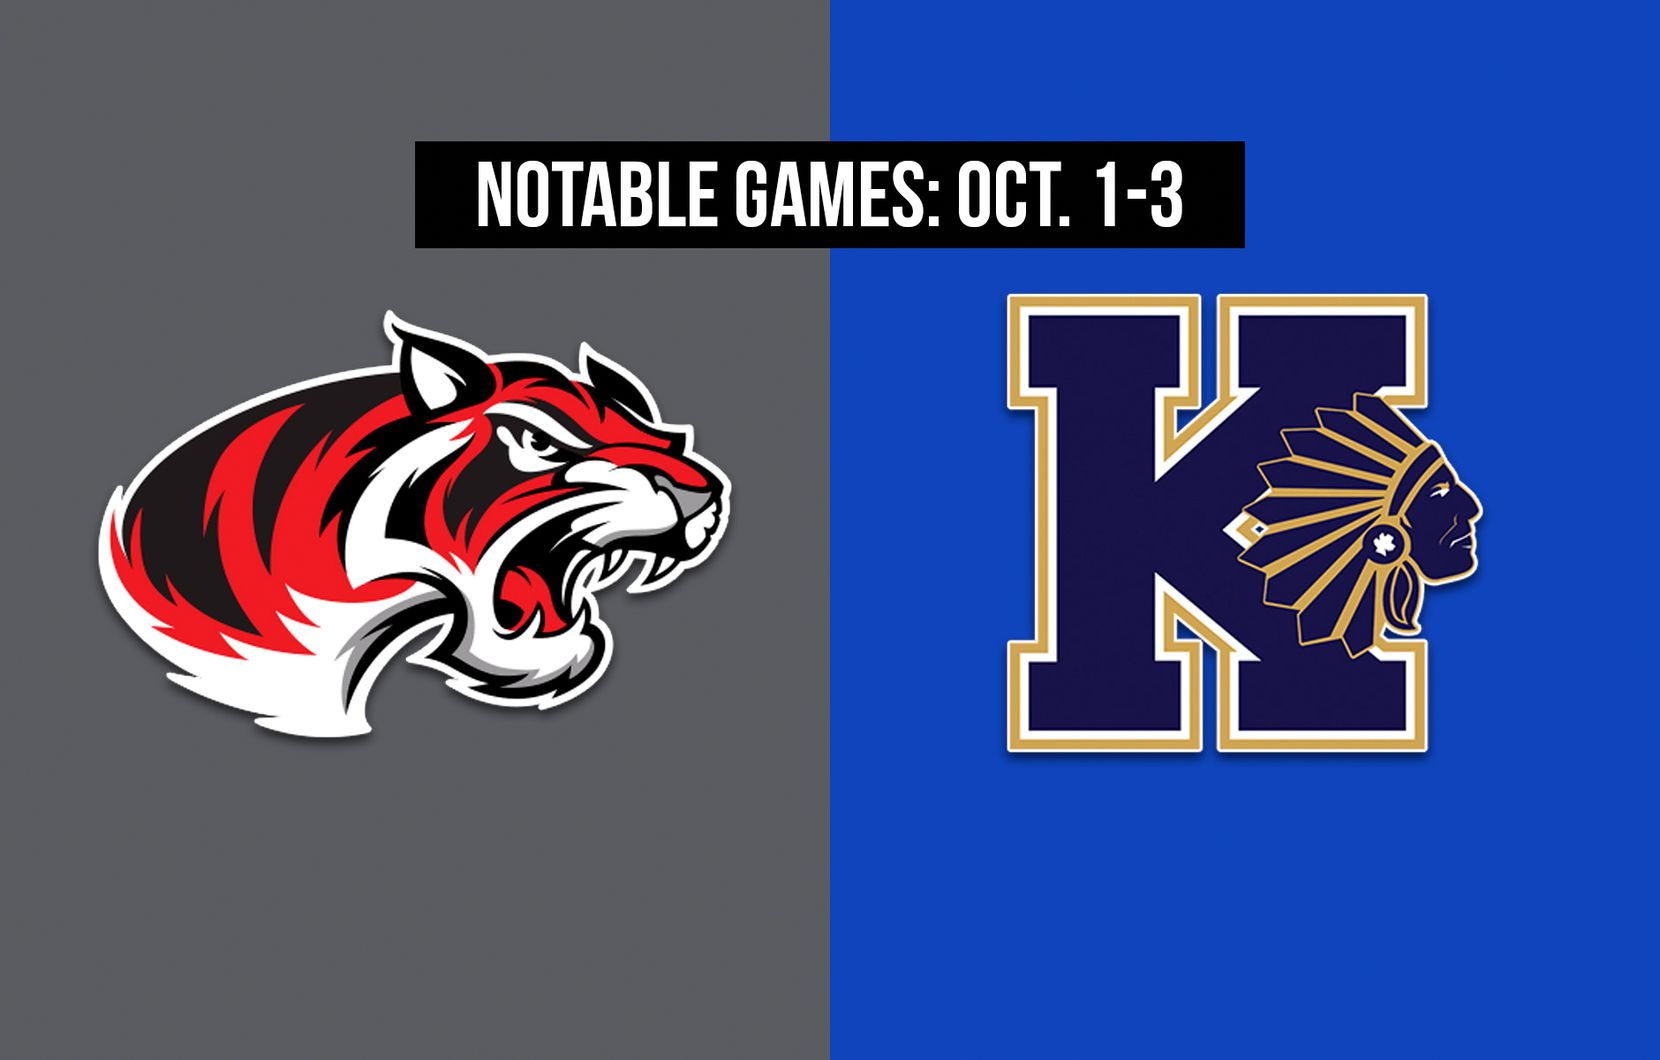 Notable games for the week of Oct. 1-3 of the 2020 season: Denton Braswell vs. Keller.